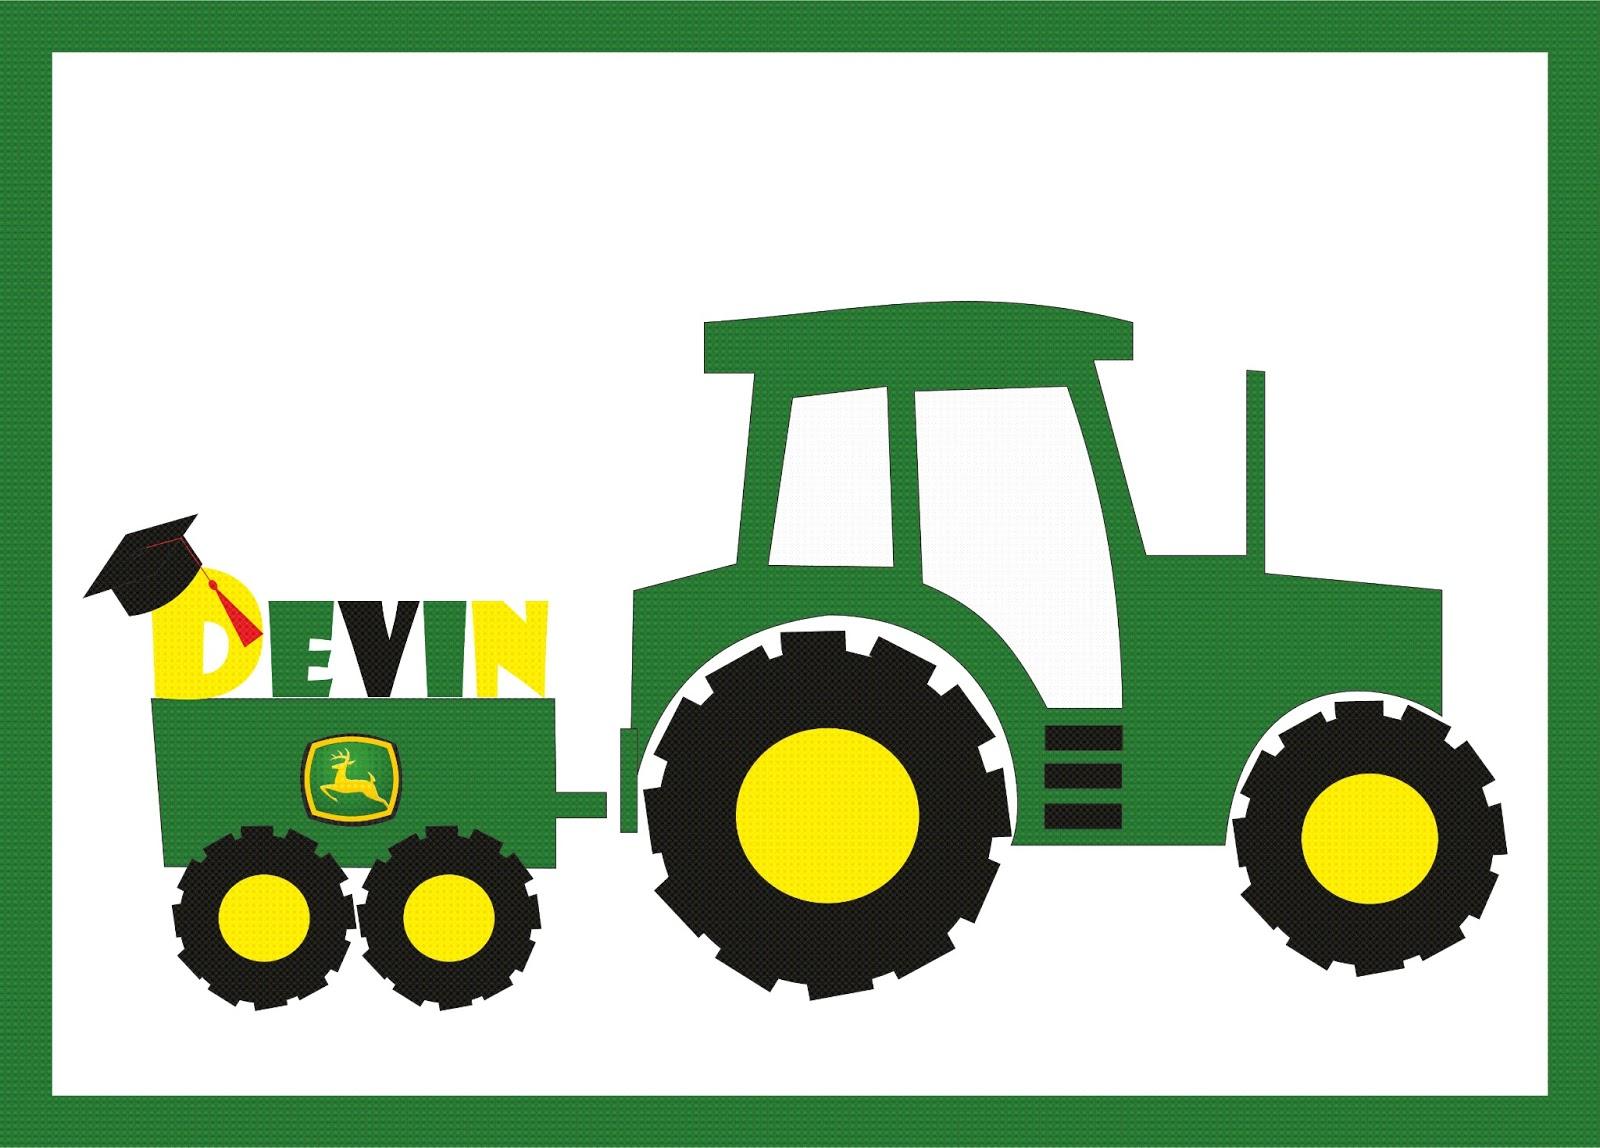 John deere green tractor clipart free images